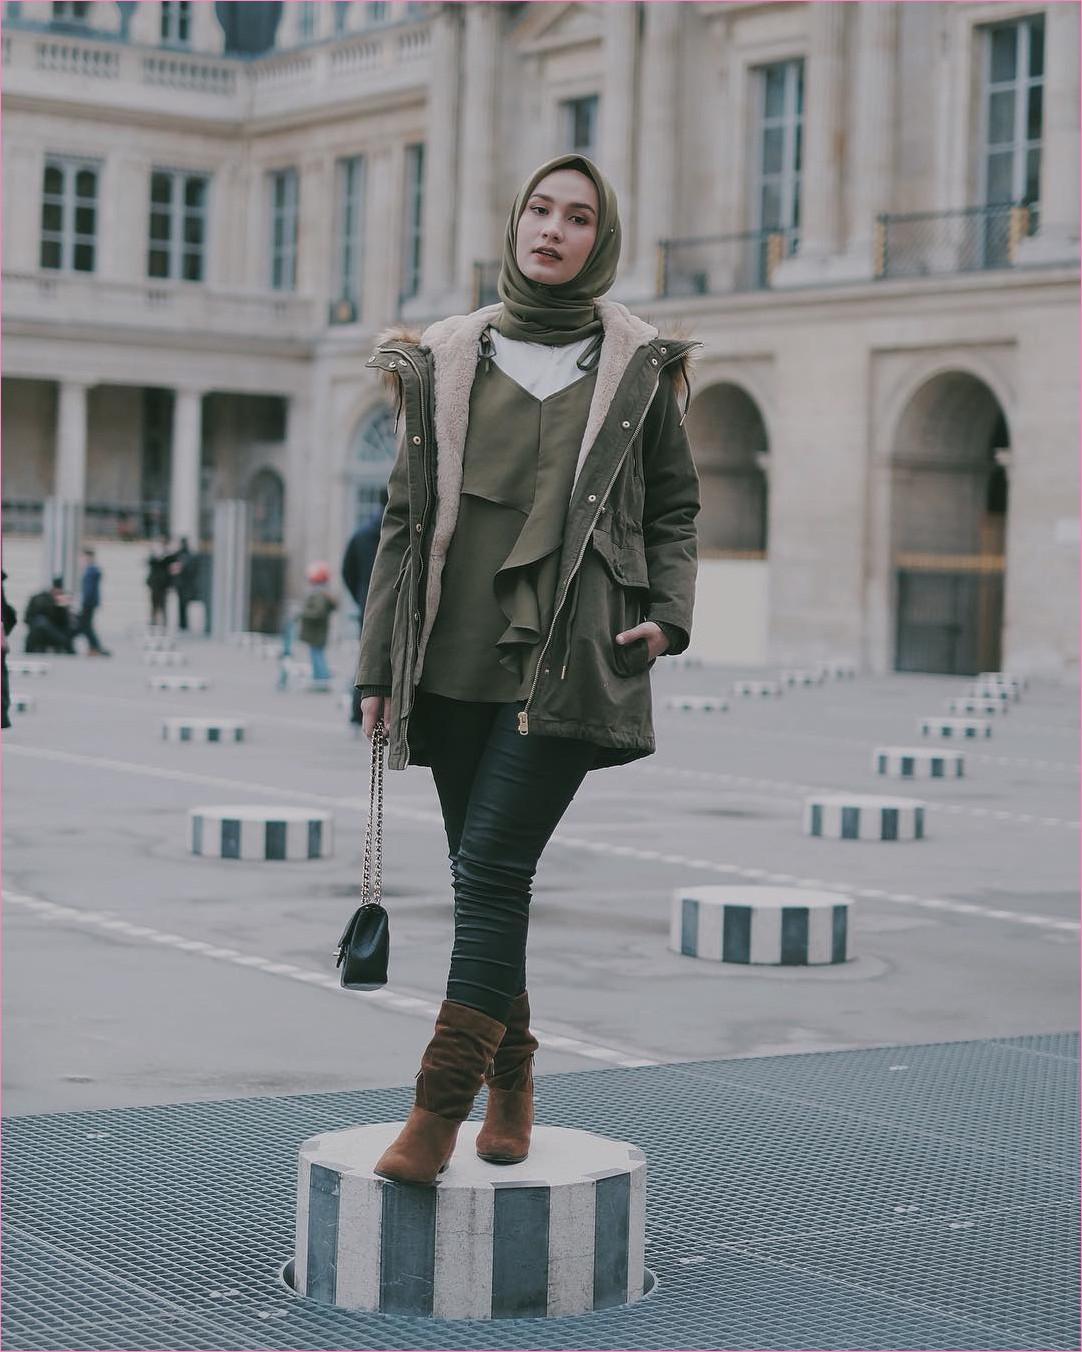 Outfit Baju Traveler Berhijab untuk Keluar Negri Ala Selebgram 2018 jacket parka top blouse outer square hijab rubby mangset putih legging jeans denim boots coklat tua slingbags channel hitam ciput rajut ootd outfit trendy coat